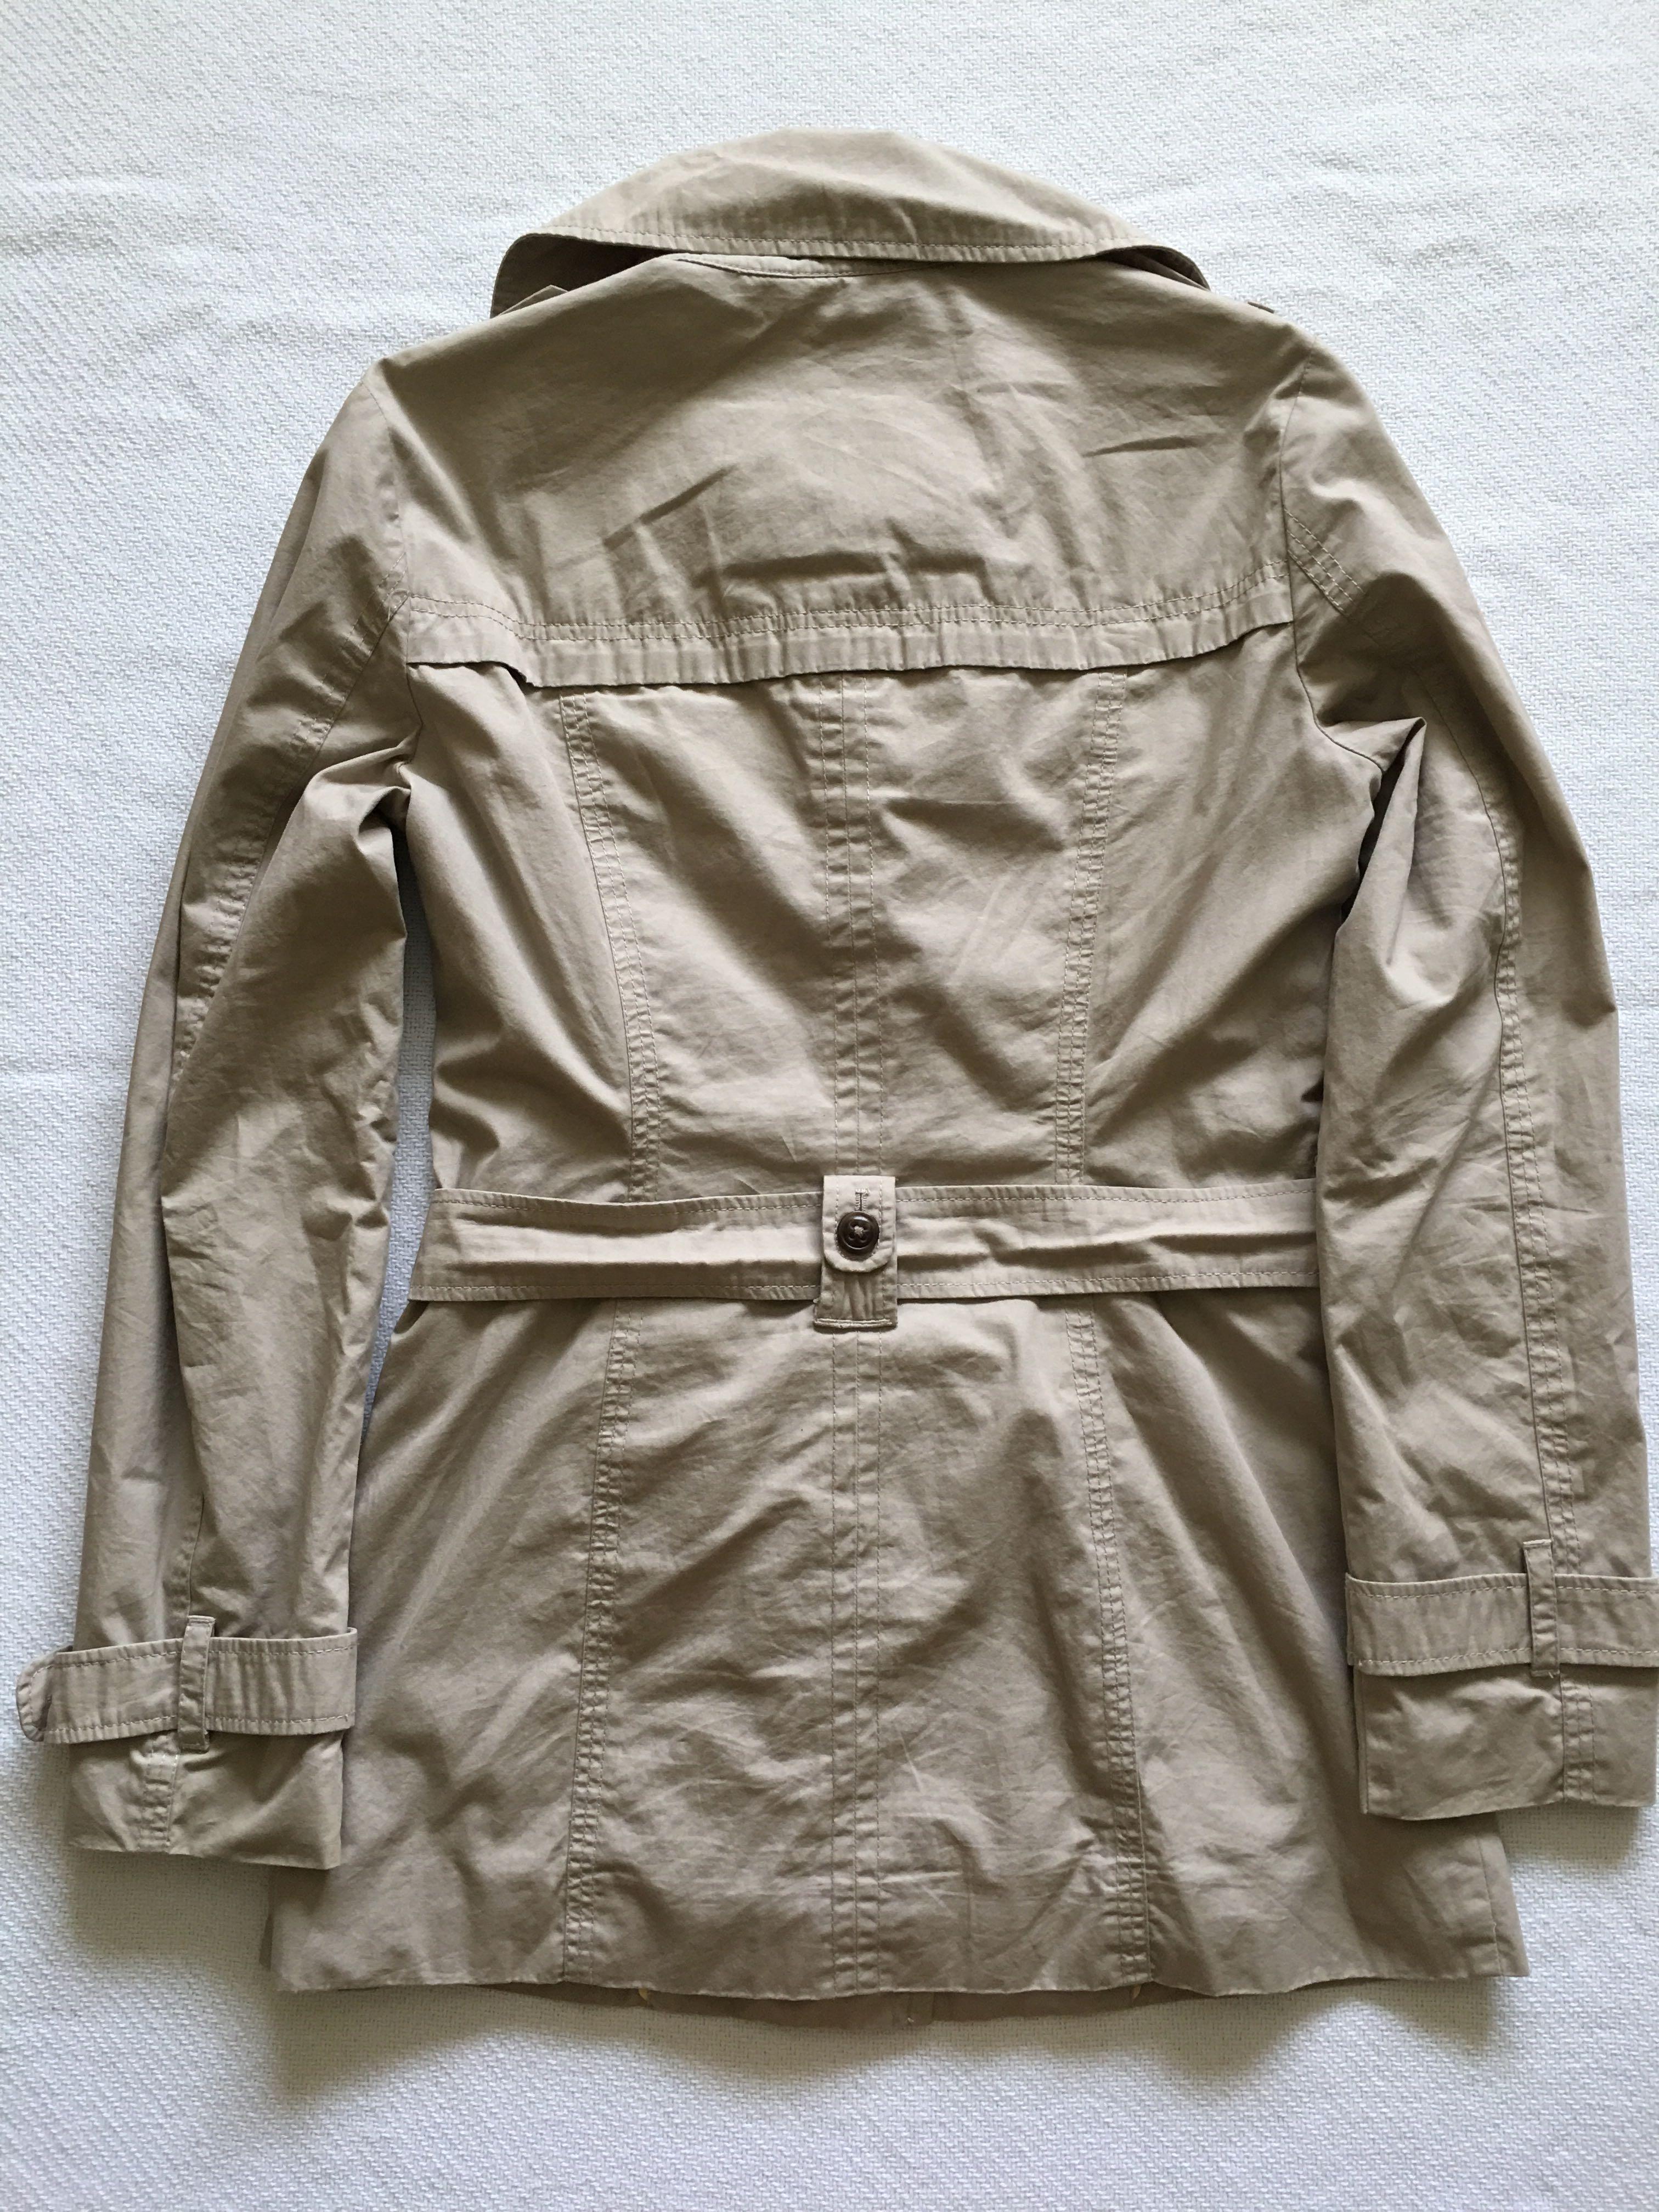 Esprit beige short trench coat - Size 4